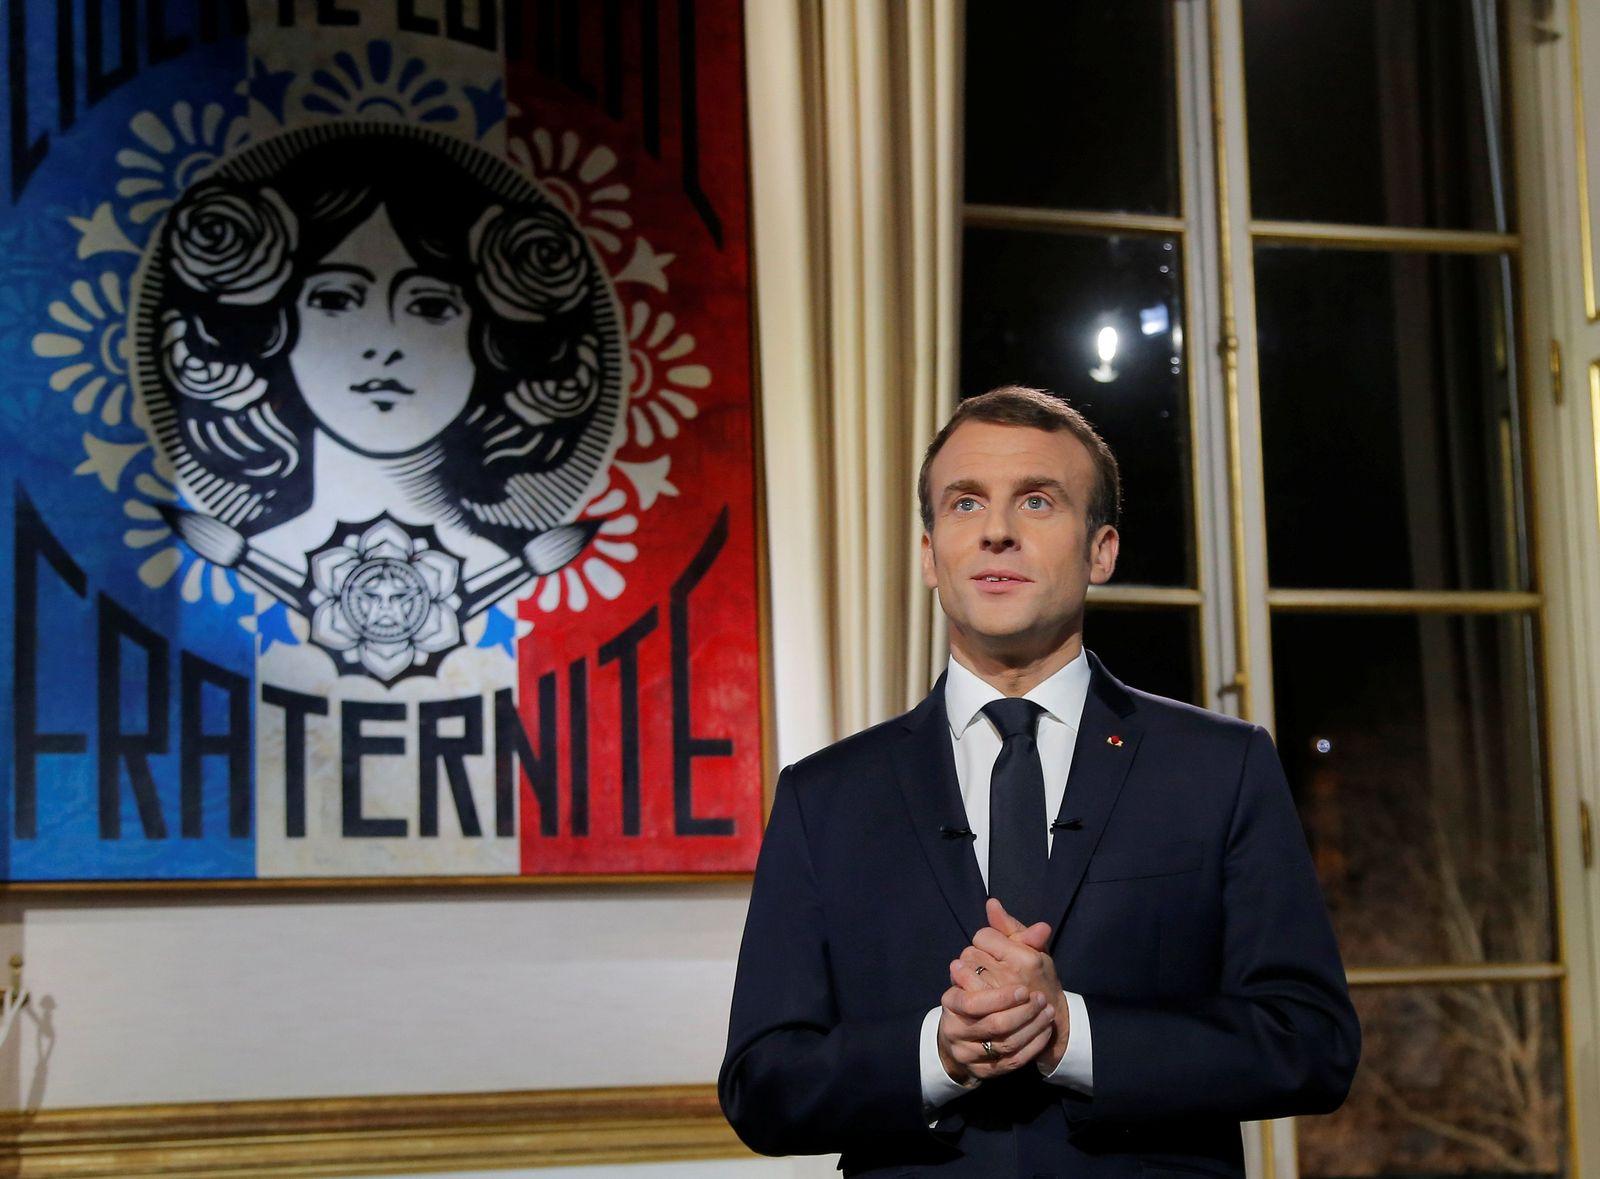 Macron/ Neujahrsansprache